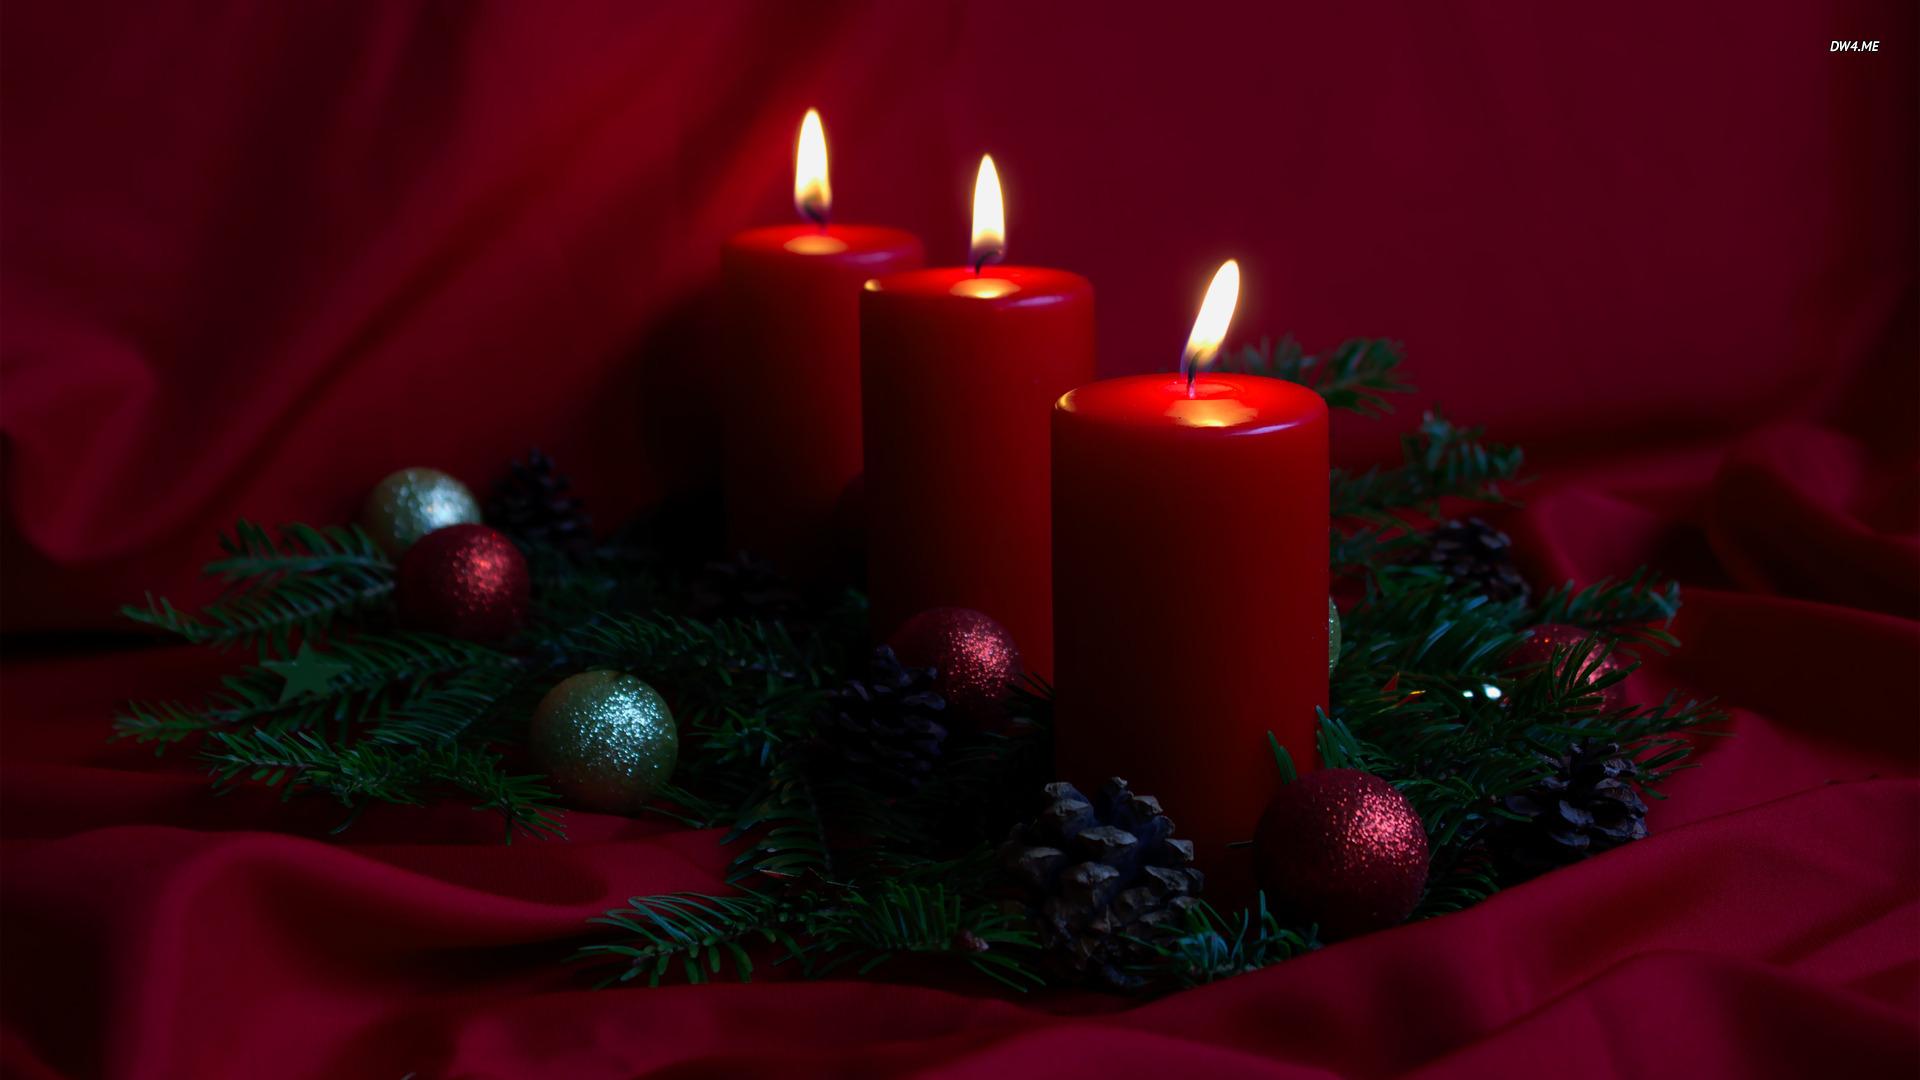 Christmas candles wallpaper 1920x1080